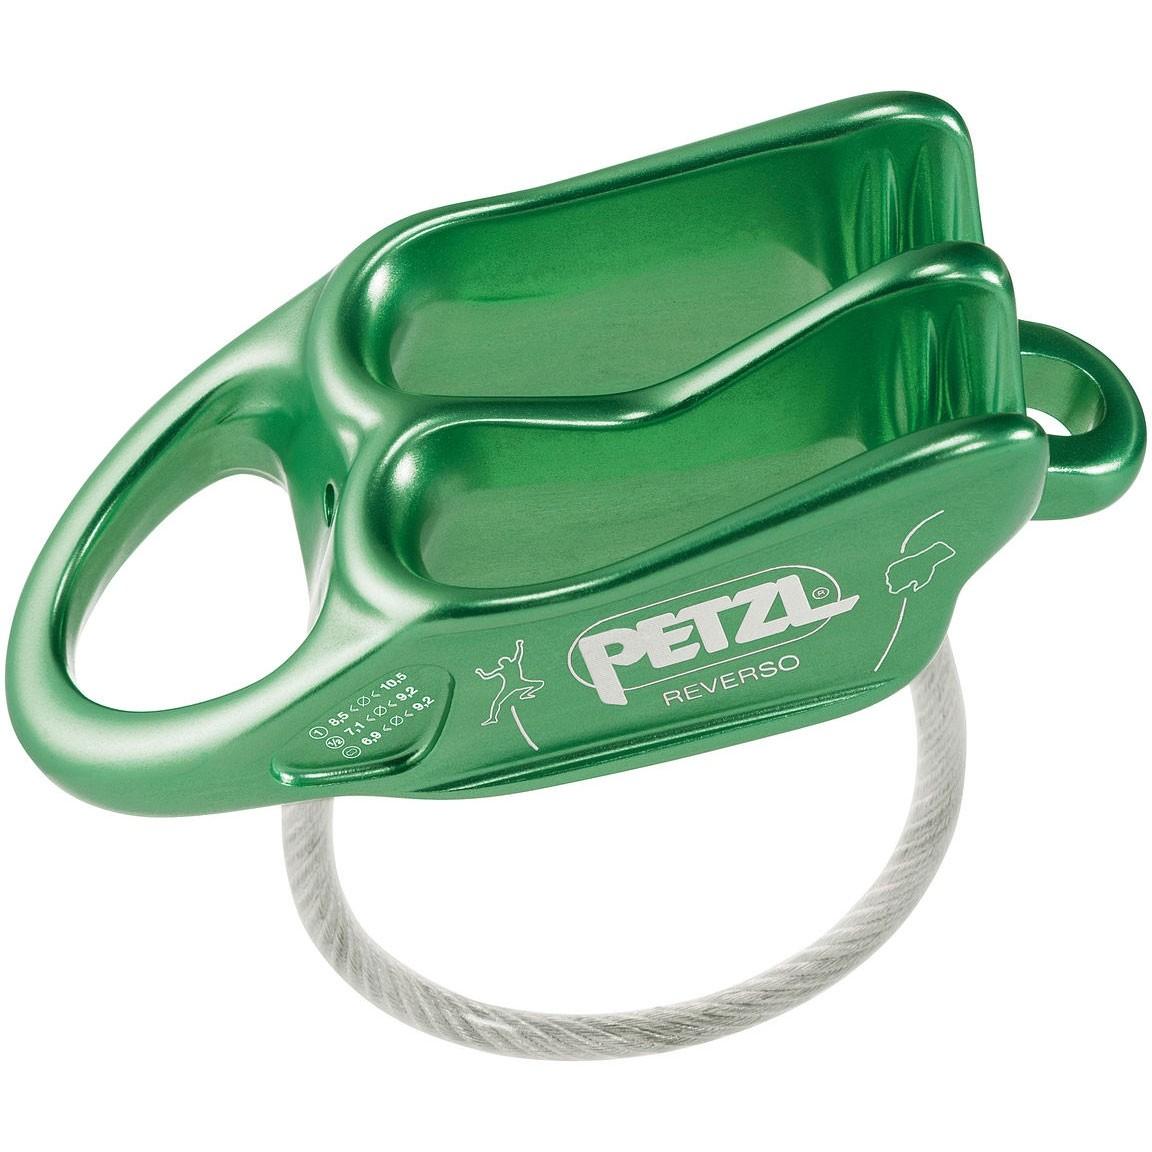 Petzl Reverso Belay Device - Green